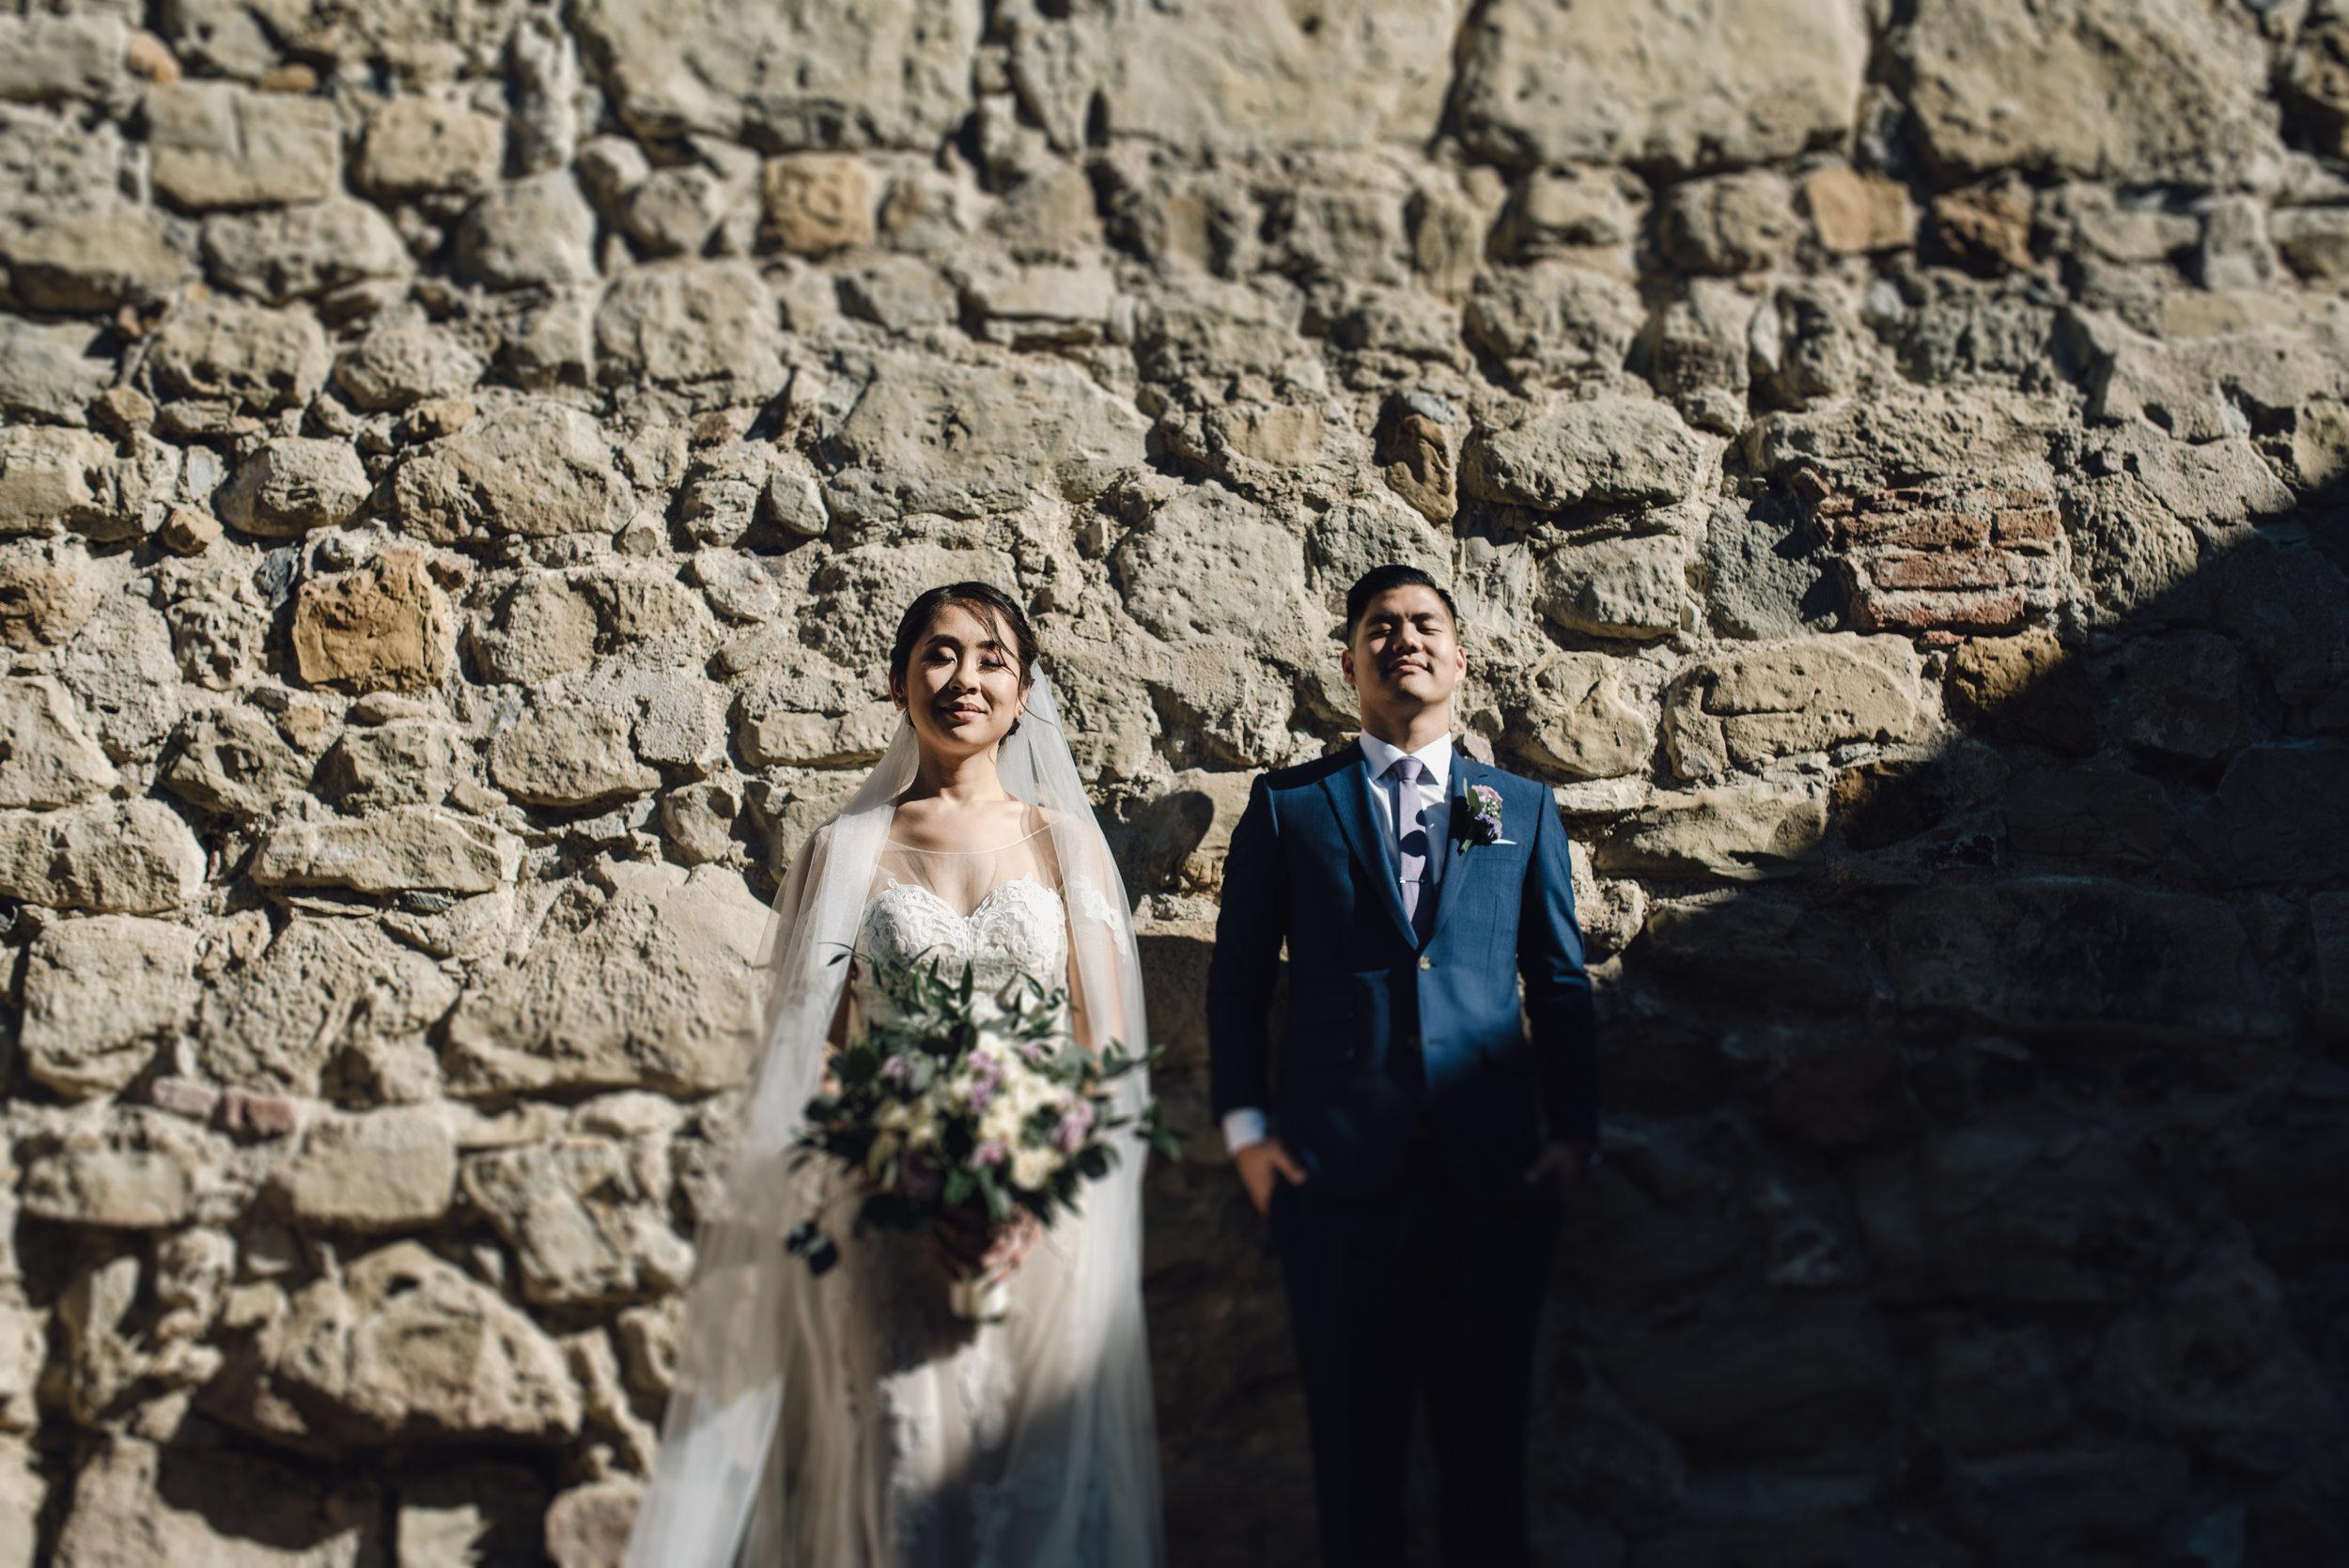 Main and Simple Photography_2017_Weddings_SanJuanCapistrano_J+B-443.jpg